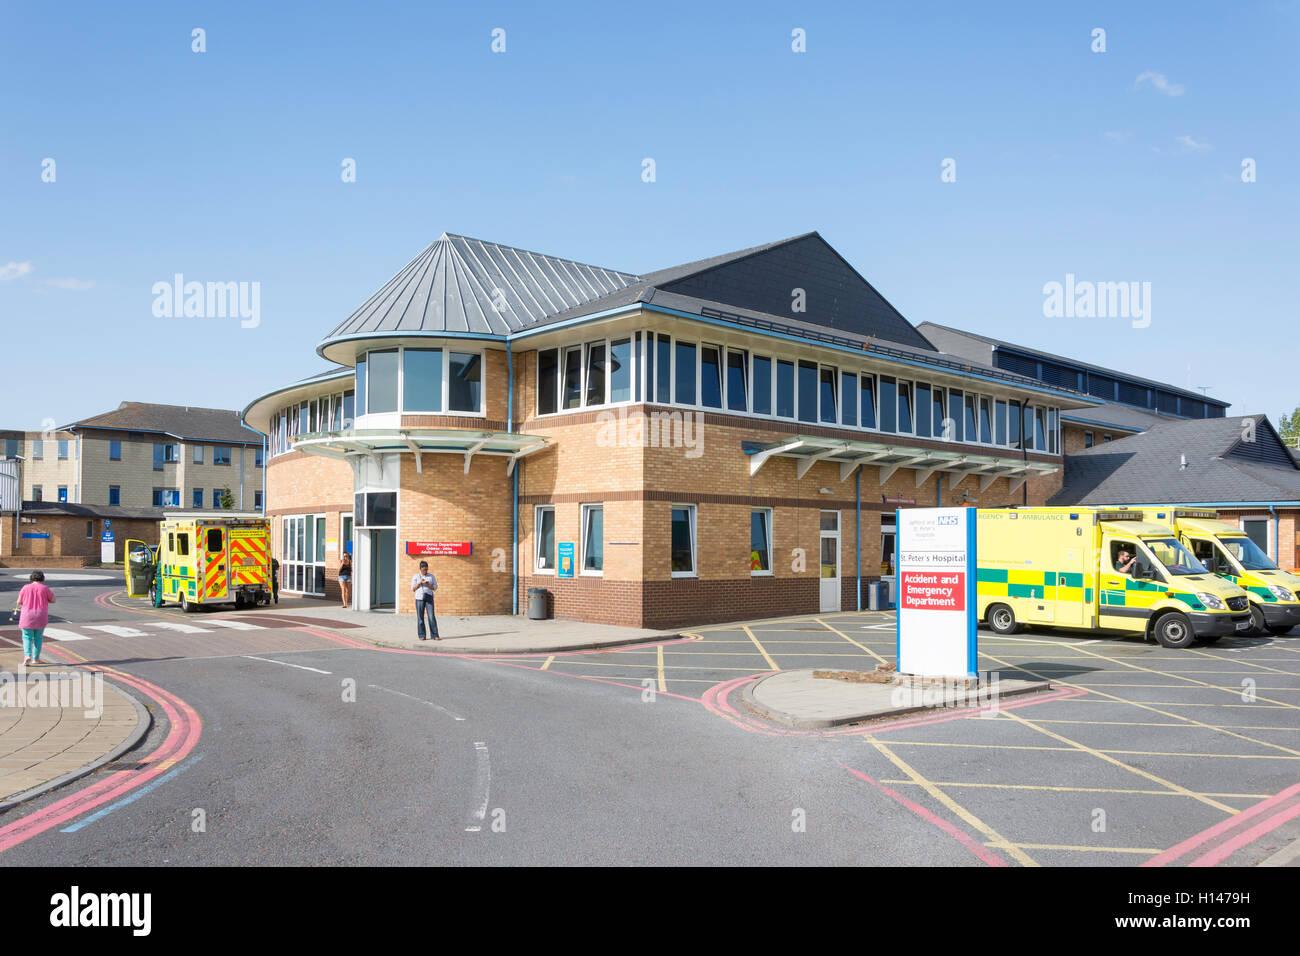 Notfallstation, St Peter's Hospital, Guildford Road, Lyne, Surrey, England, Vereinigtes Königreich Stockbild